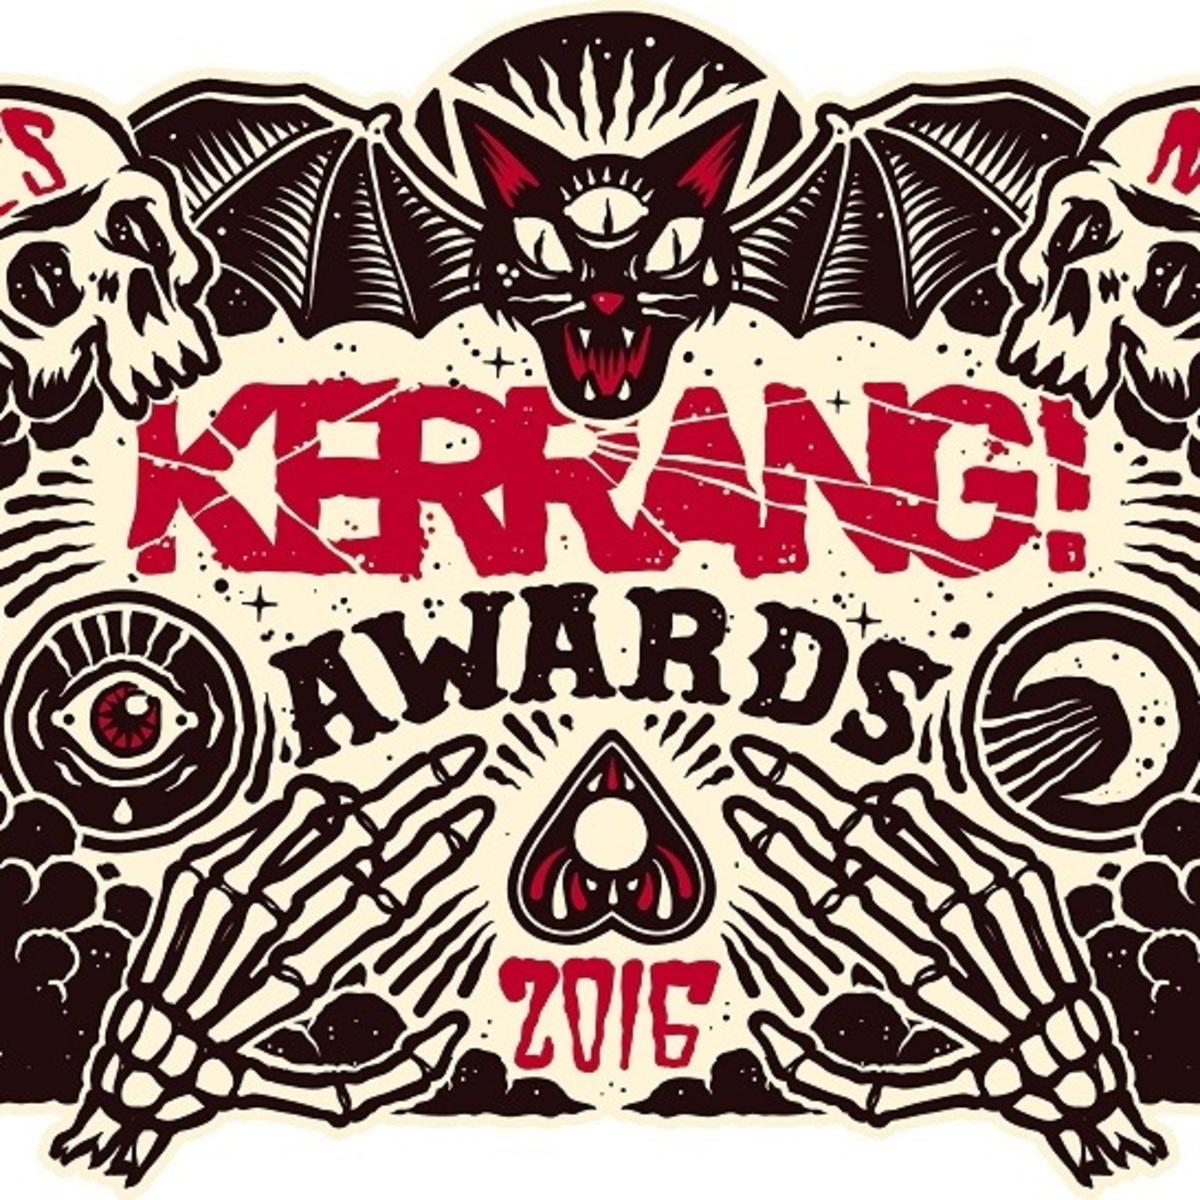 Articlehome k awards 2016 700x546